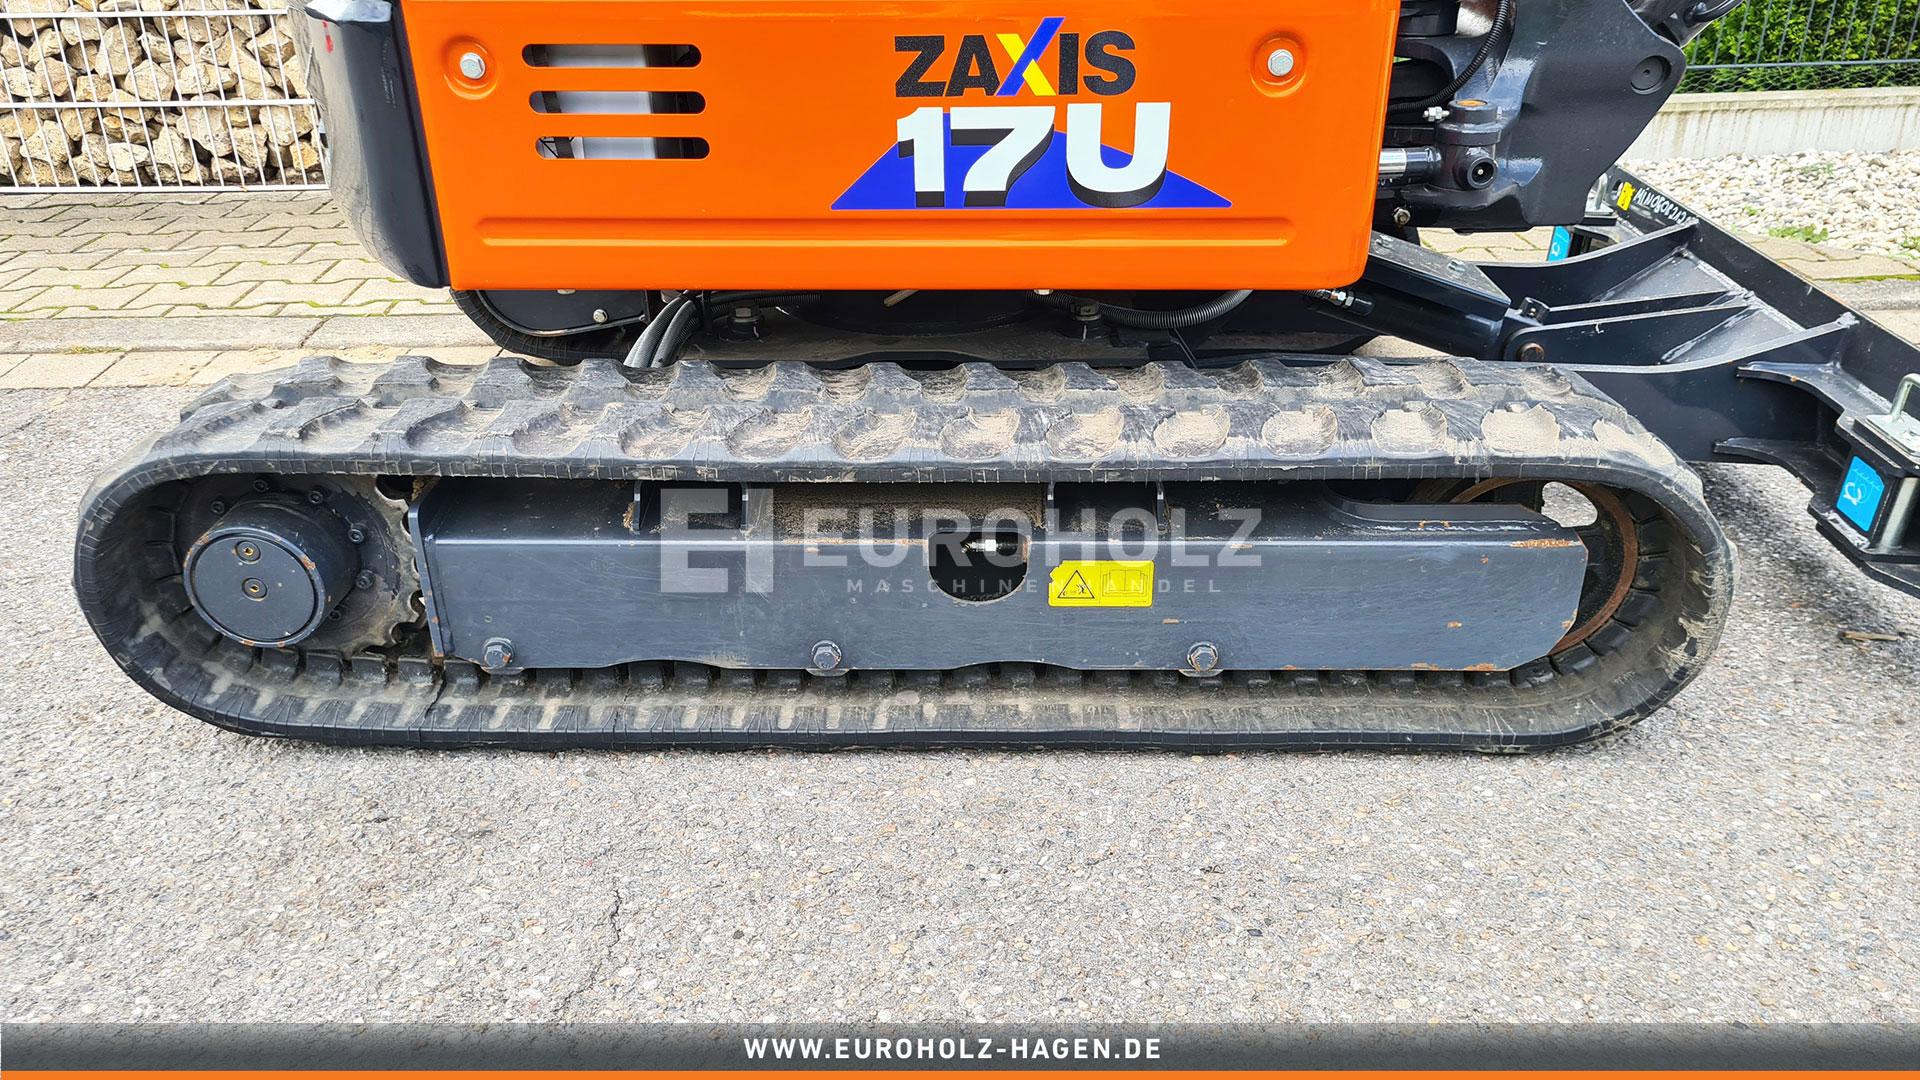 Minibagger Hitachi ZX 17U - 6 YR wie Neu nur 41 Bh MS01